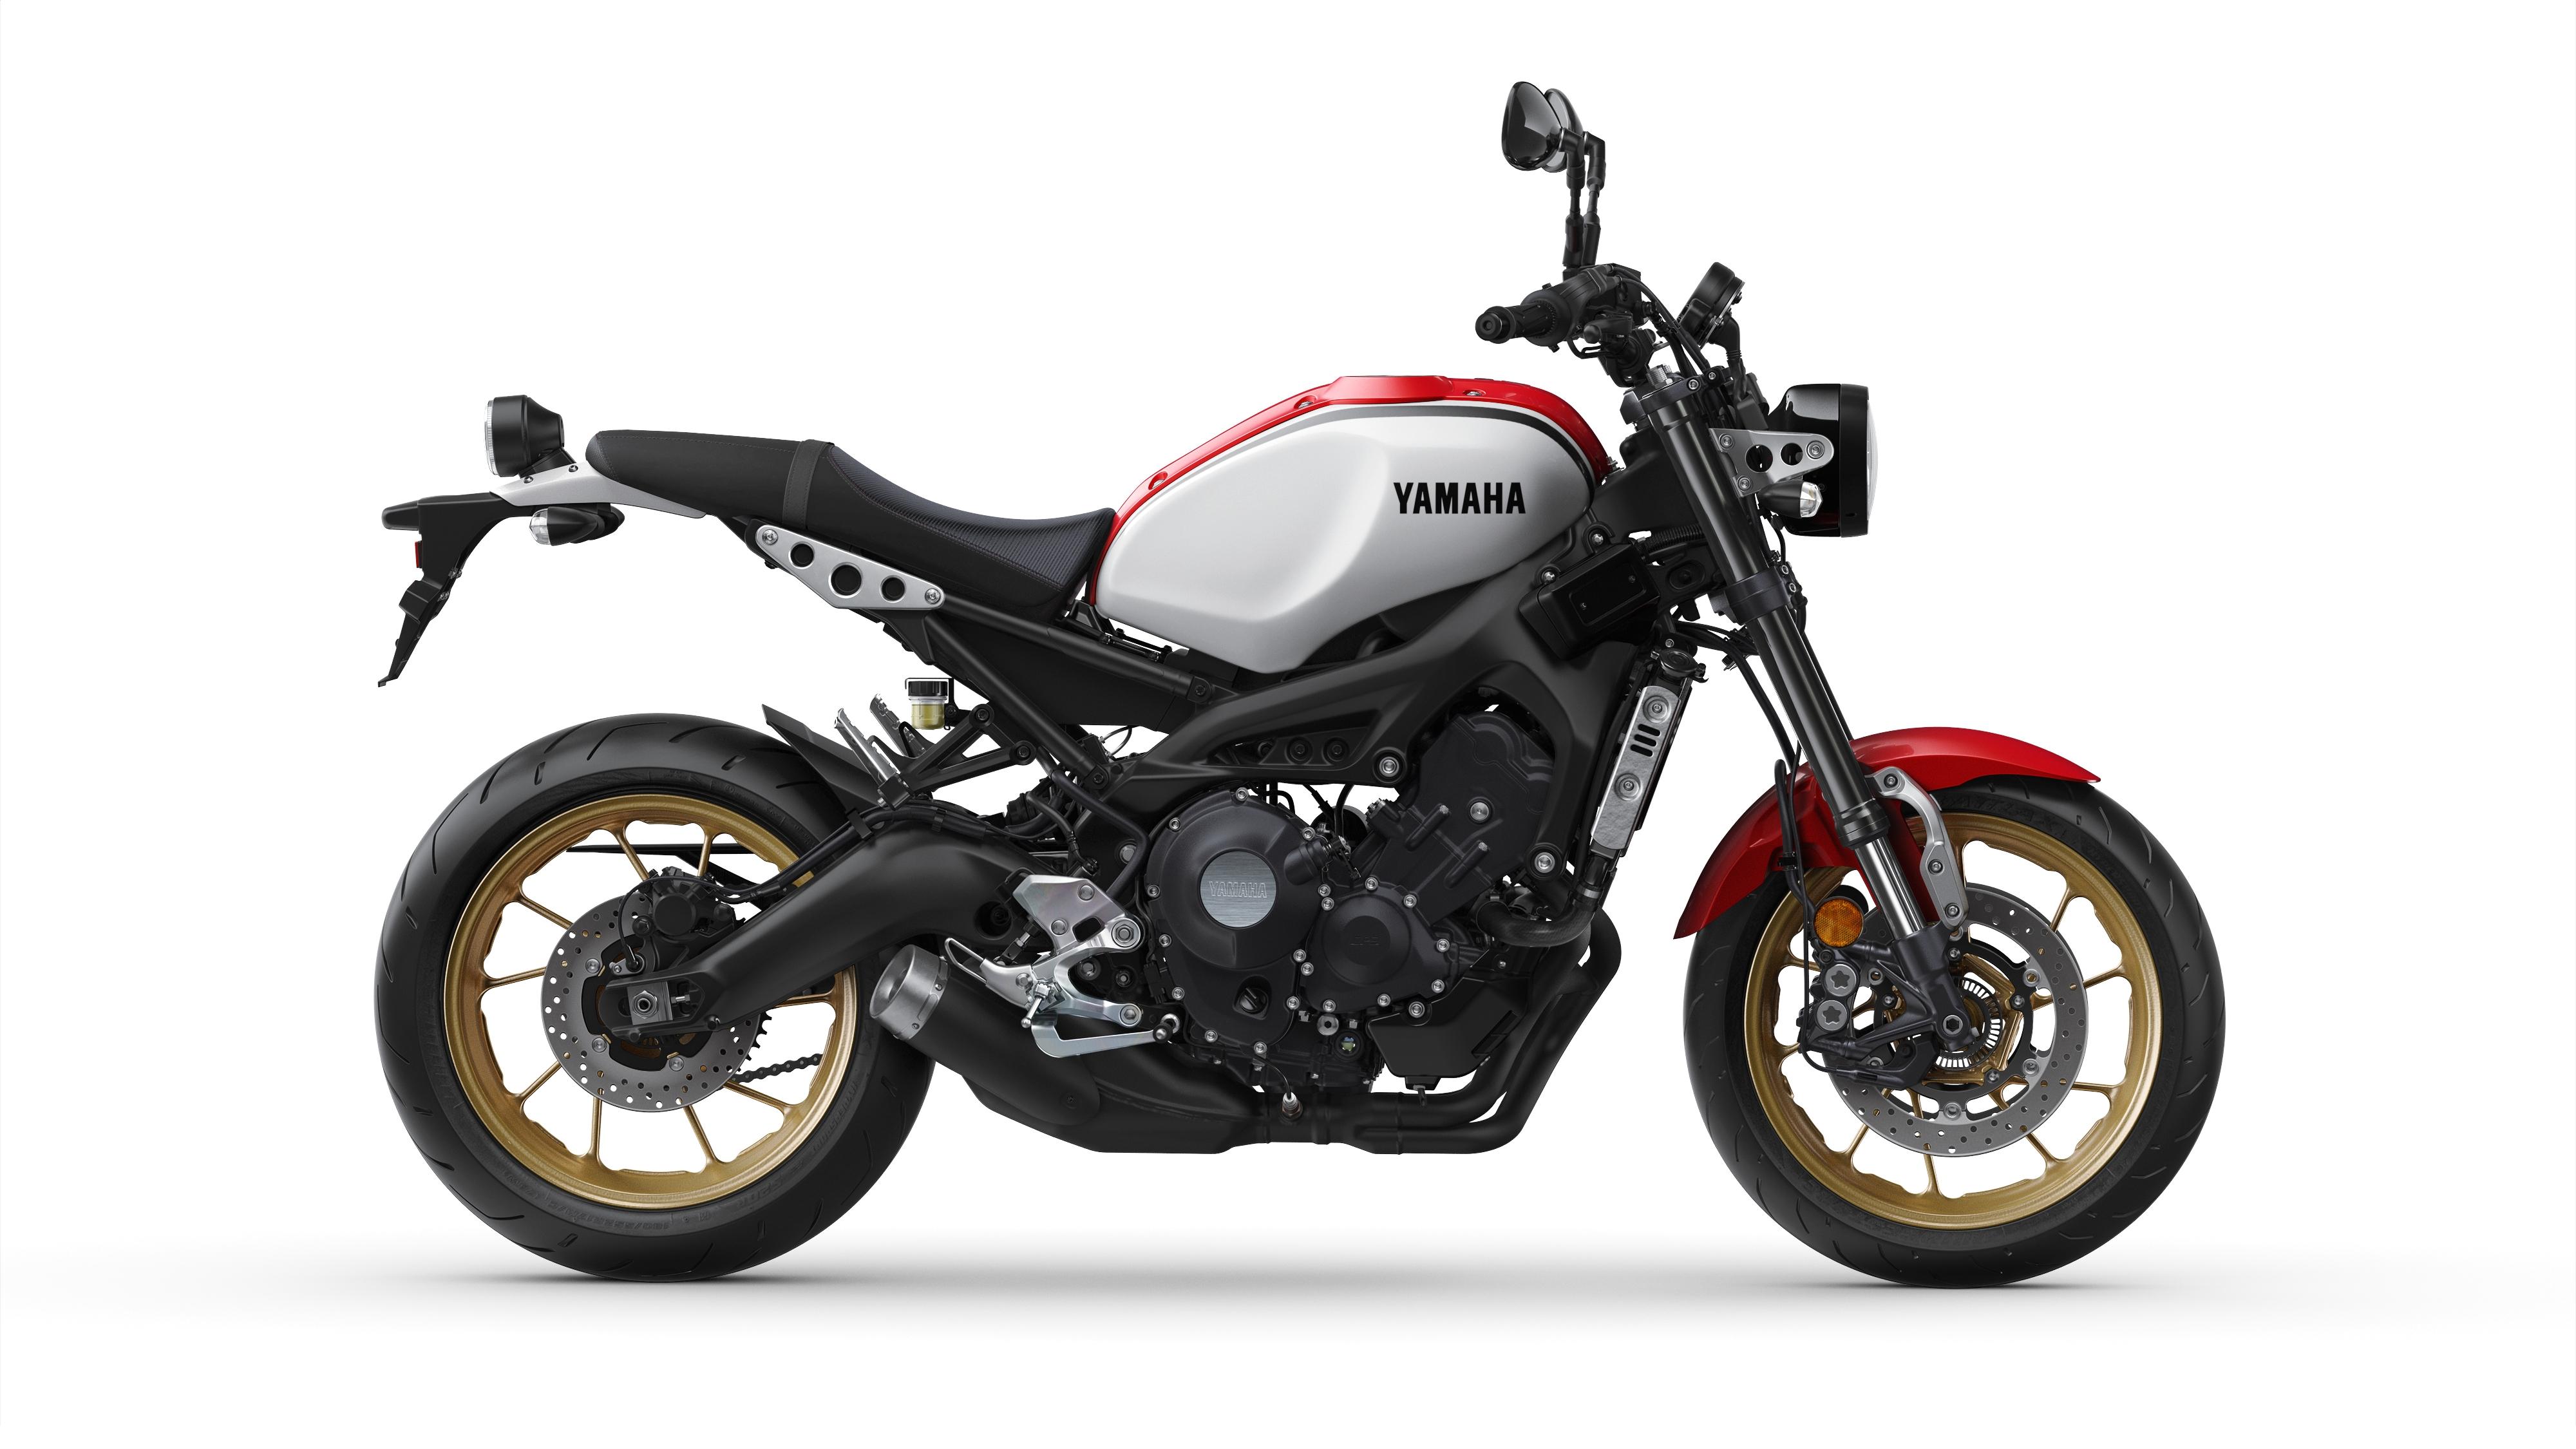 Yamaha XSR900 nu bestellen